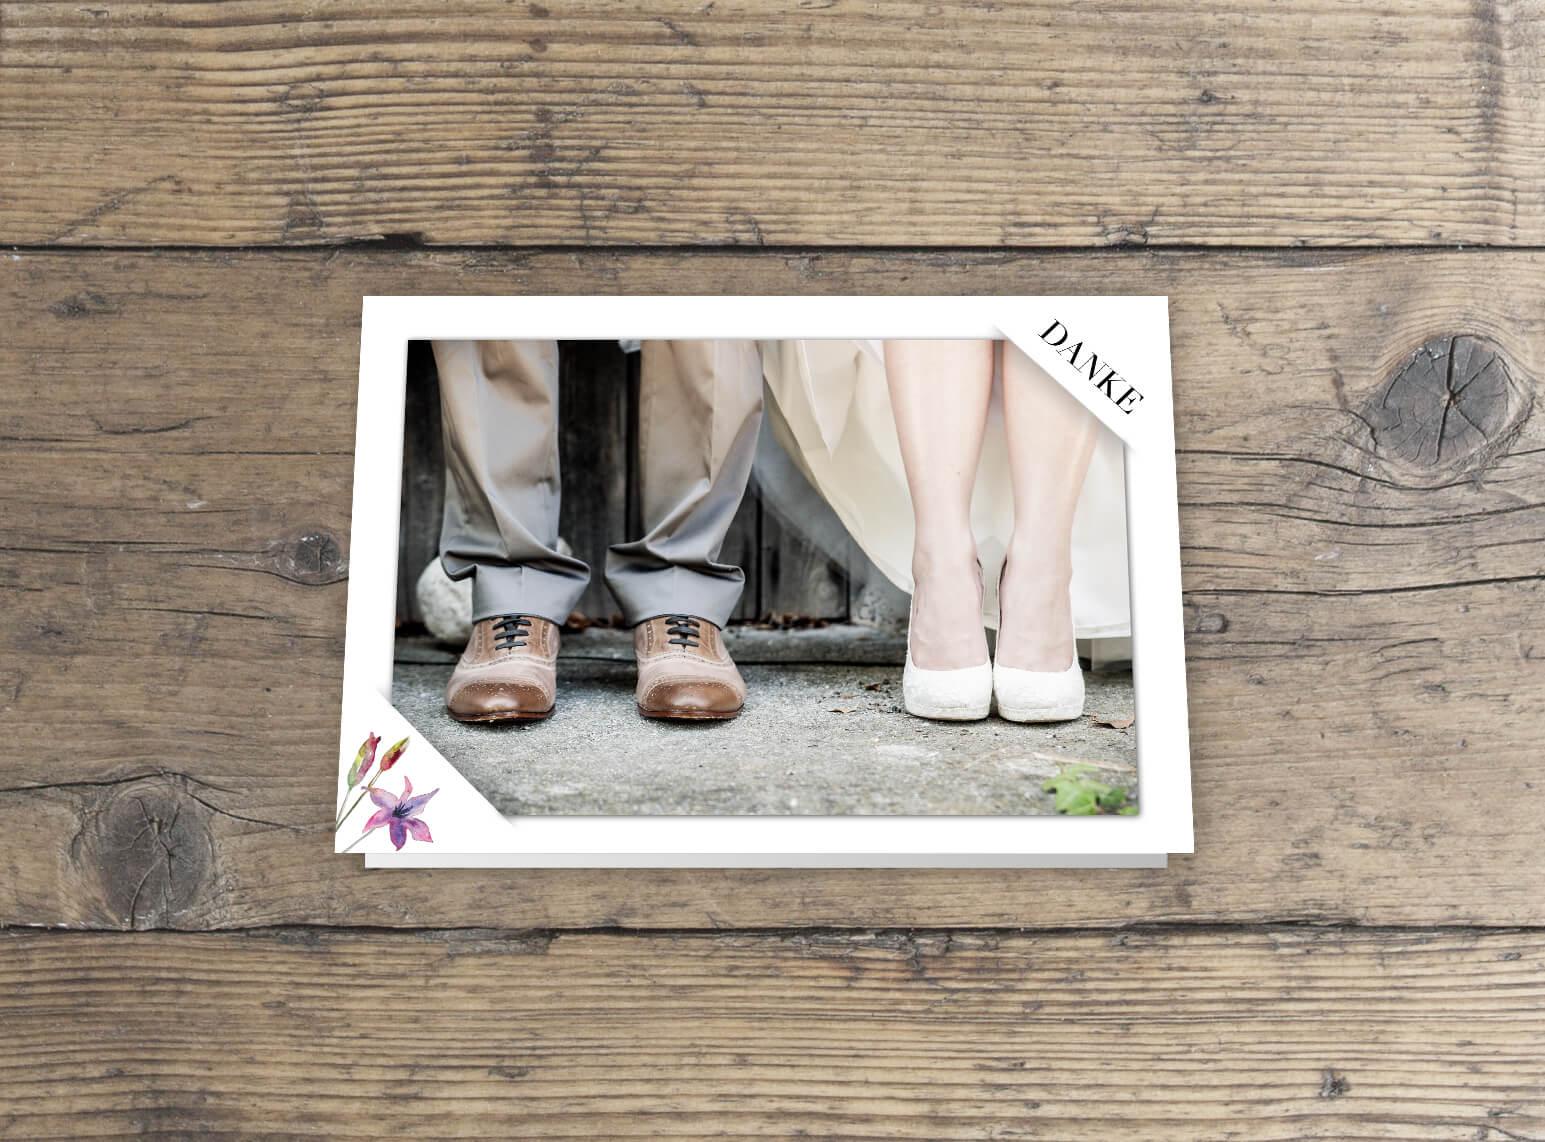 Dankeskarte mit Einsteckfoto Klappkarte Rosen Aquarell Design